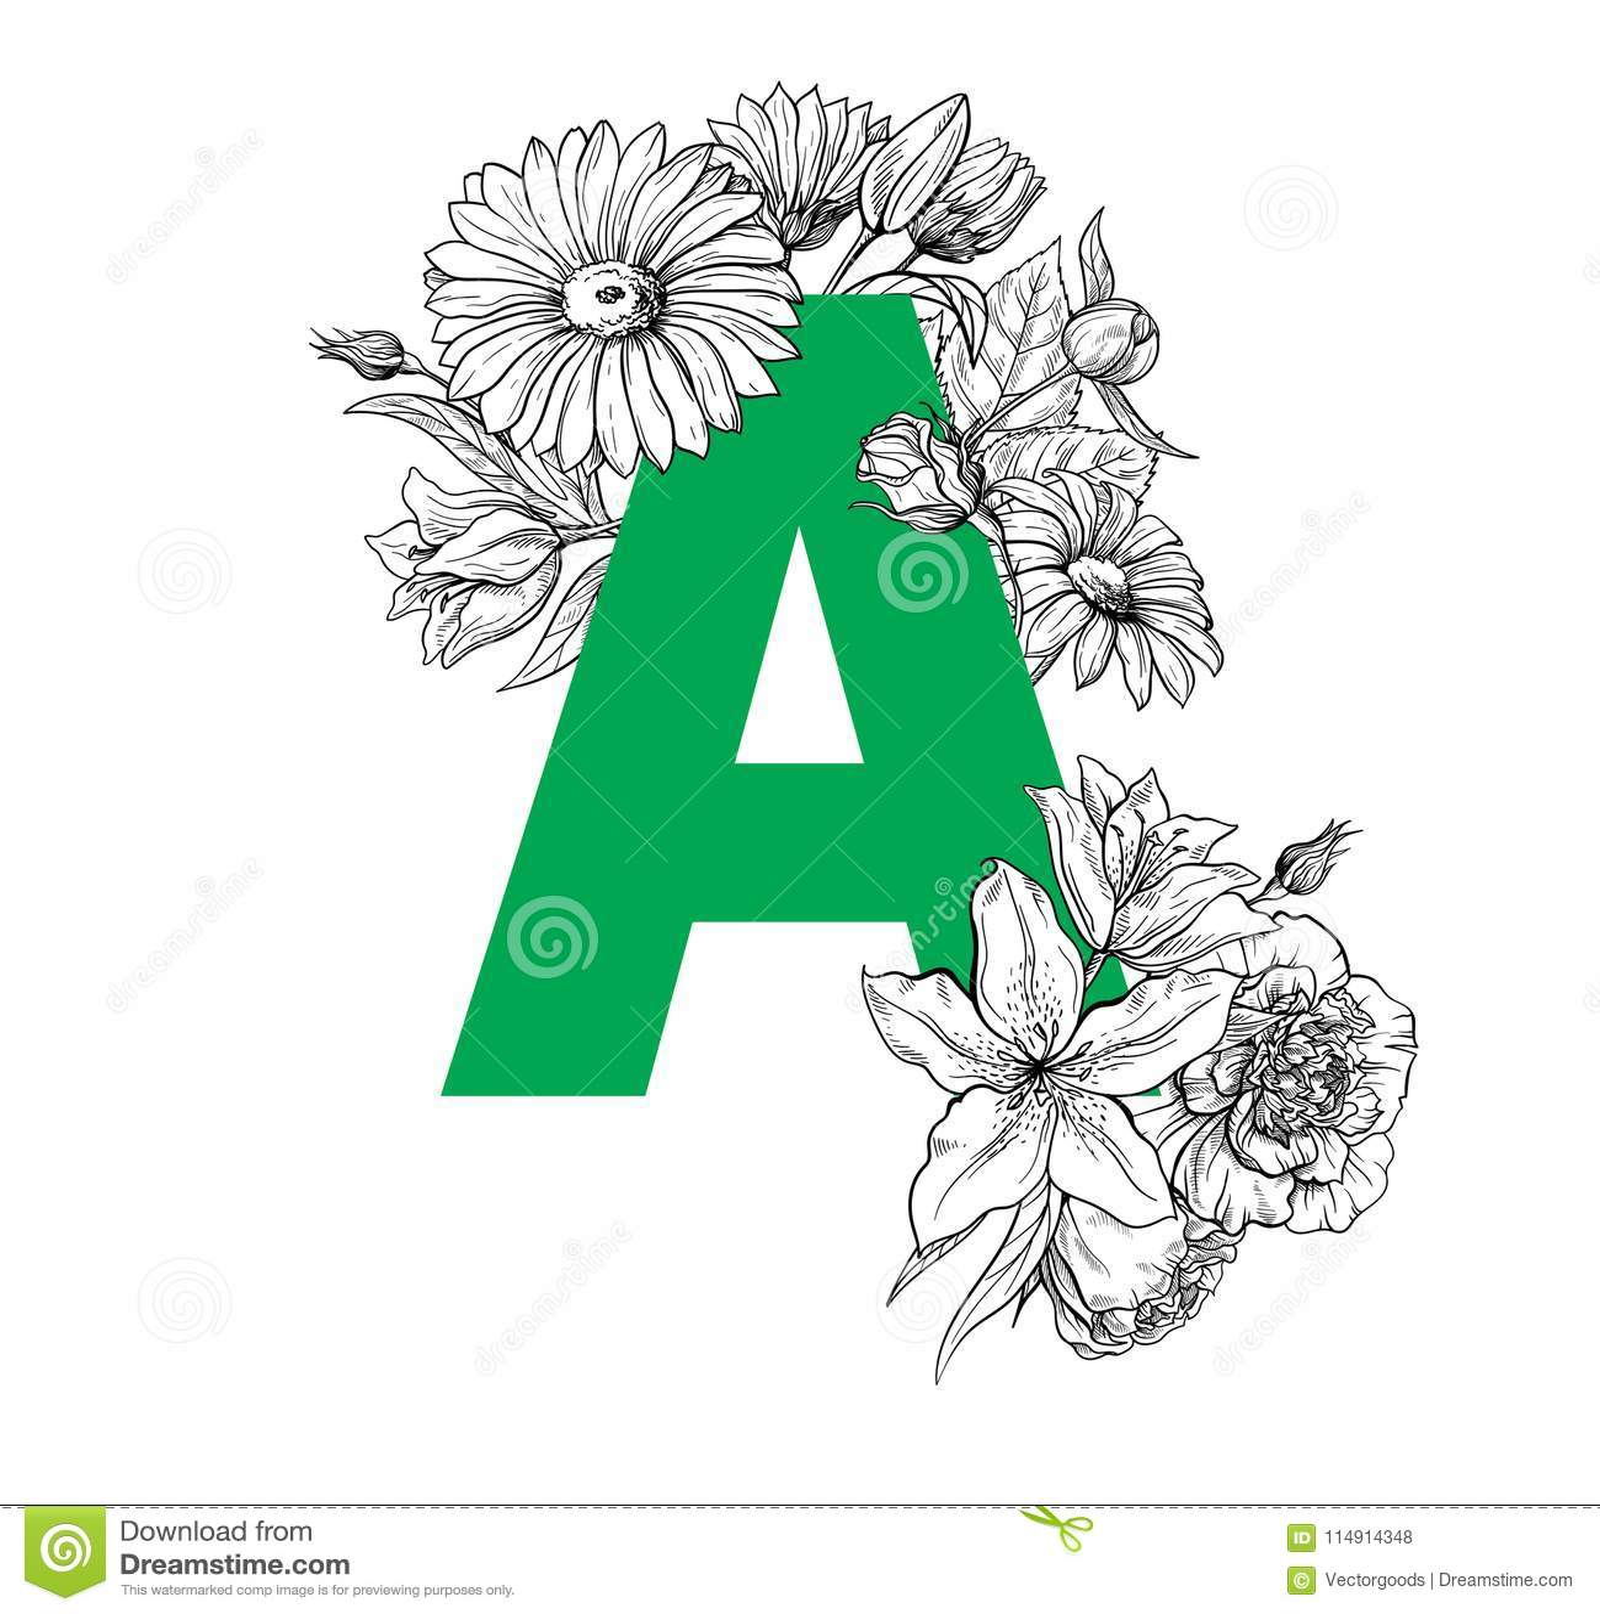 Vintage Flower Alphabet Hand Drawn Vector Illustration Isolated On White Background Stock Vector Illustration Of Cartoon Leaf 114914348